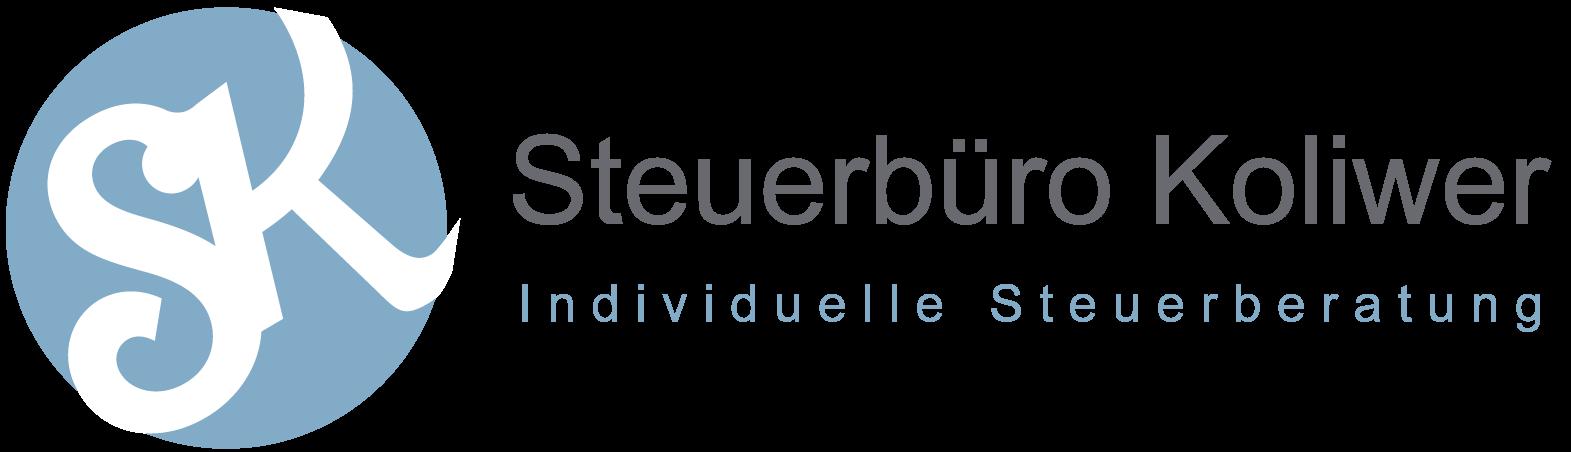 Steuerbuero Koliwer Logo